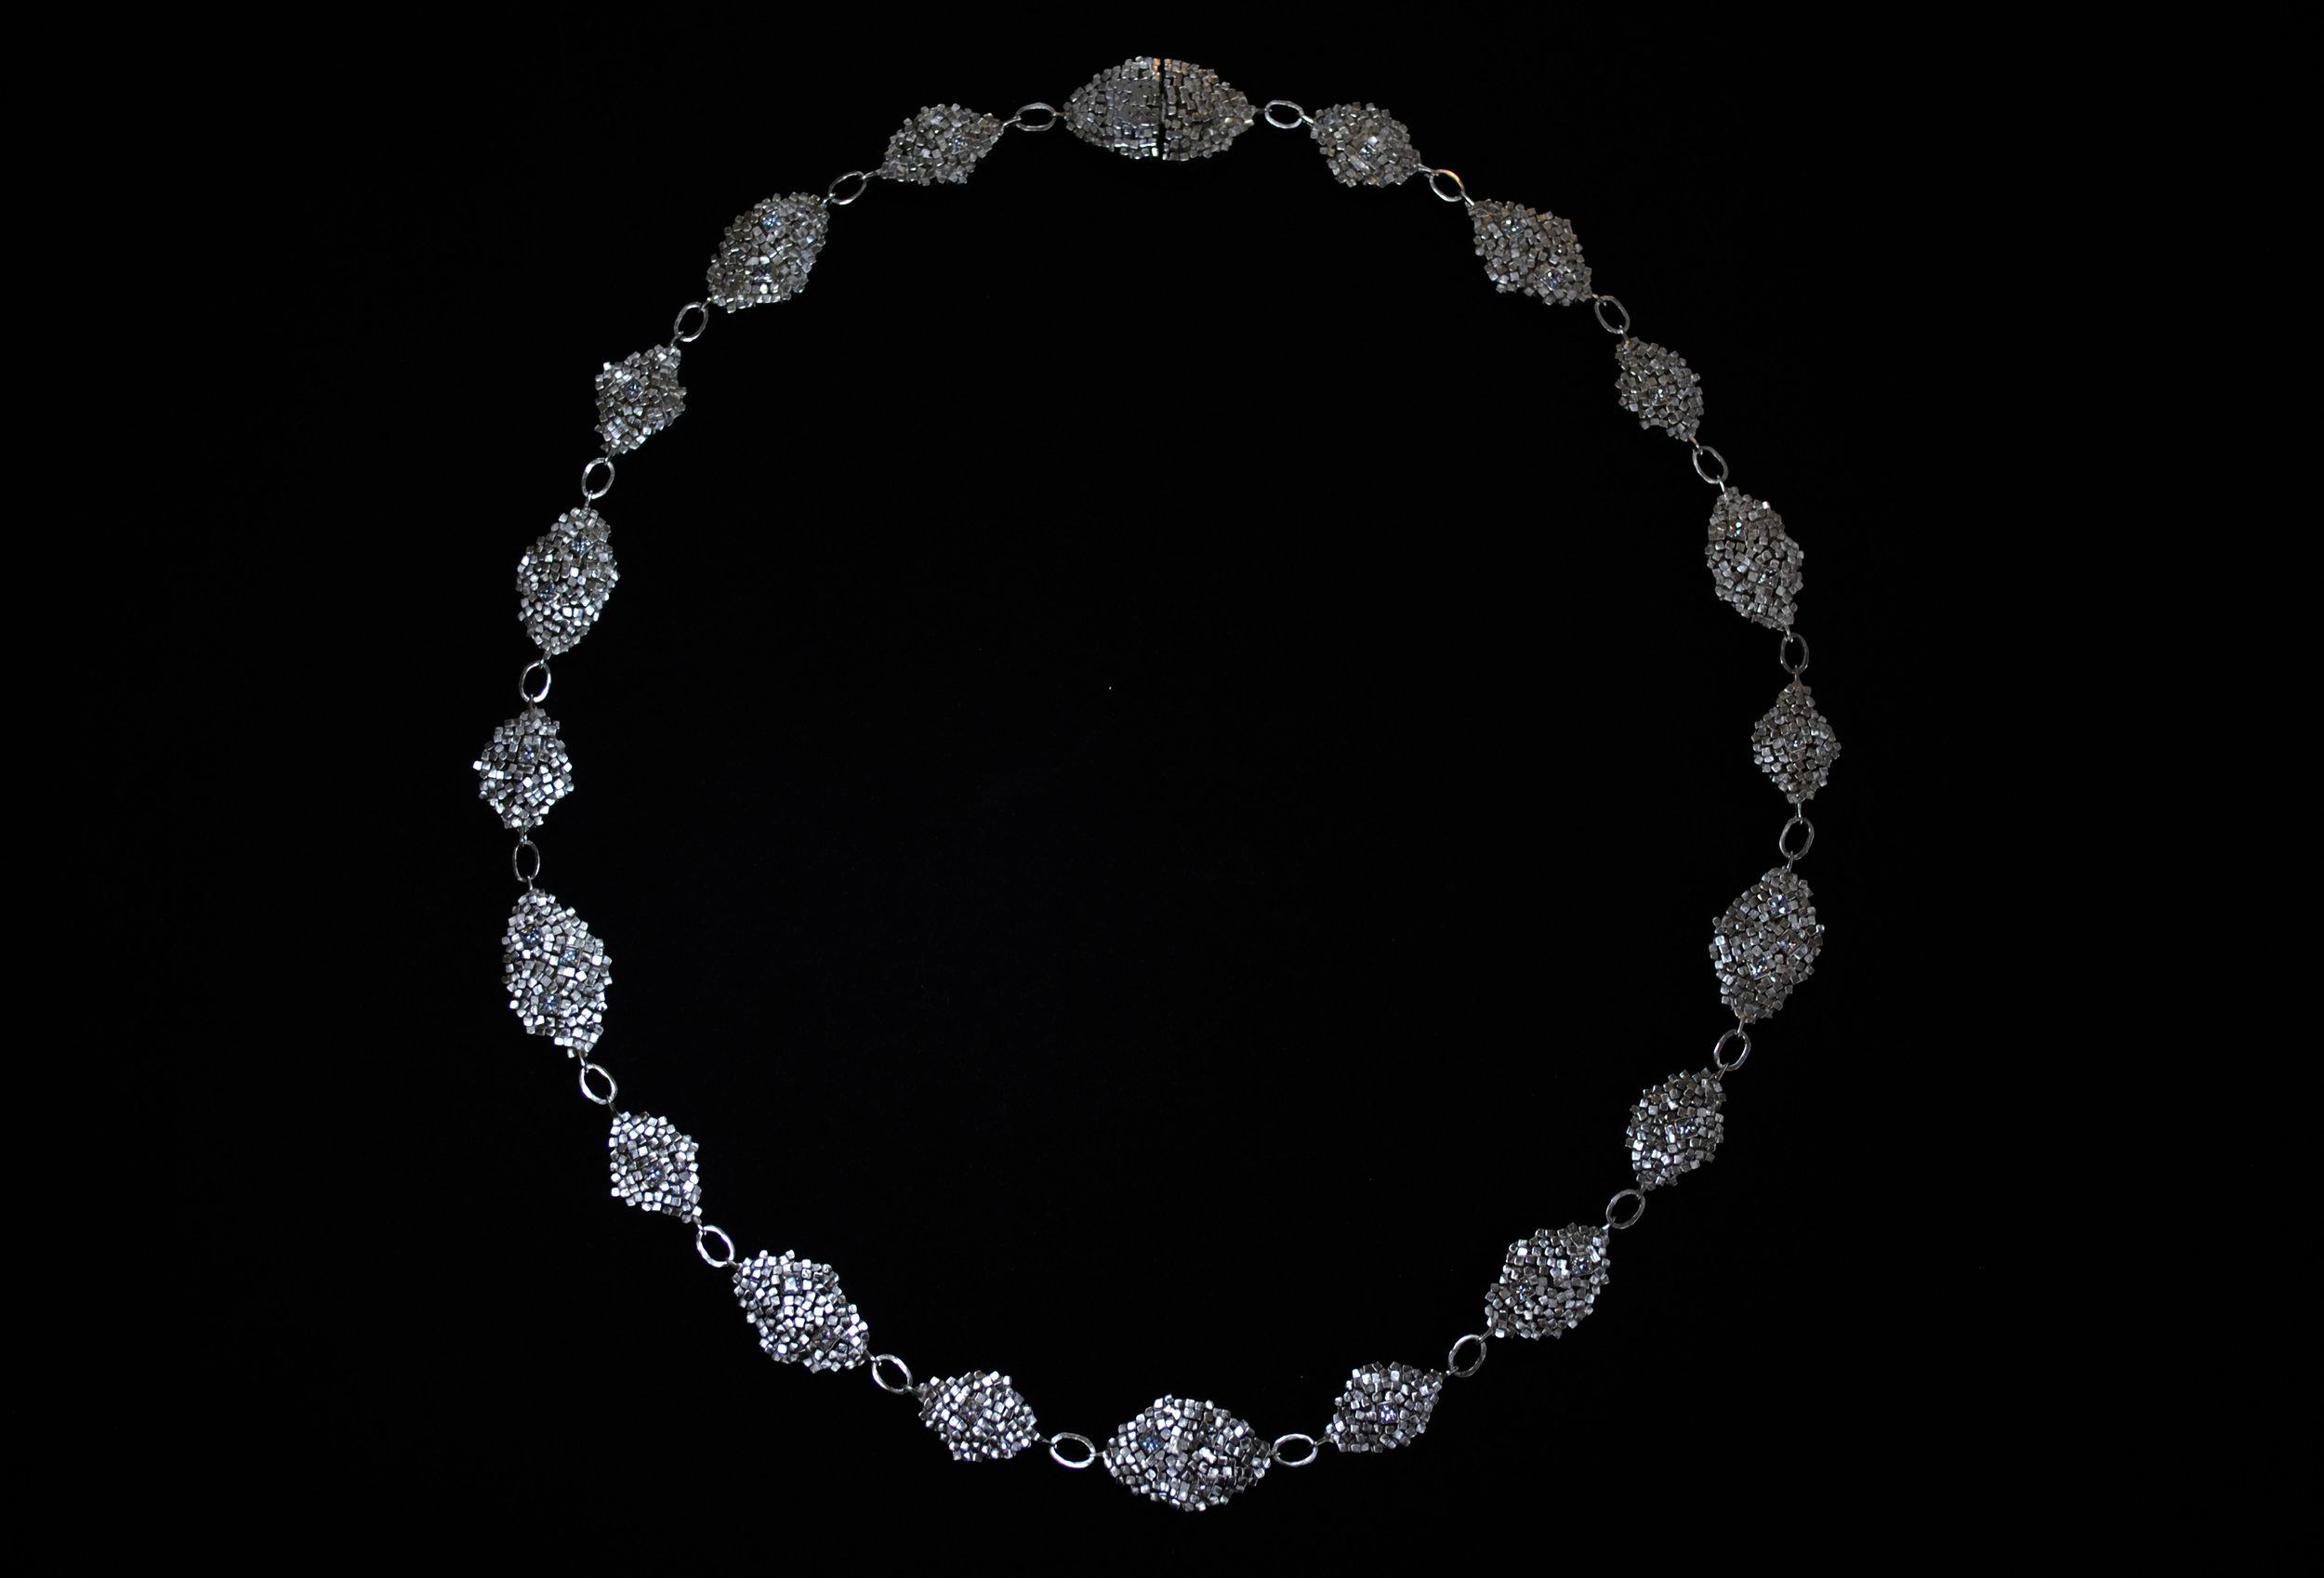 Rebecca Sarah Black - Encrusted Necklace - 2017.JPG